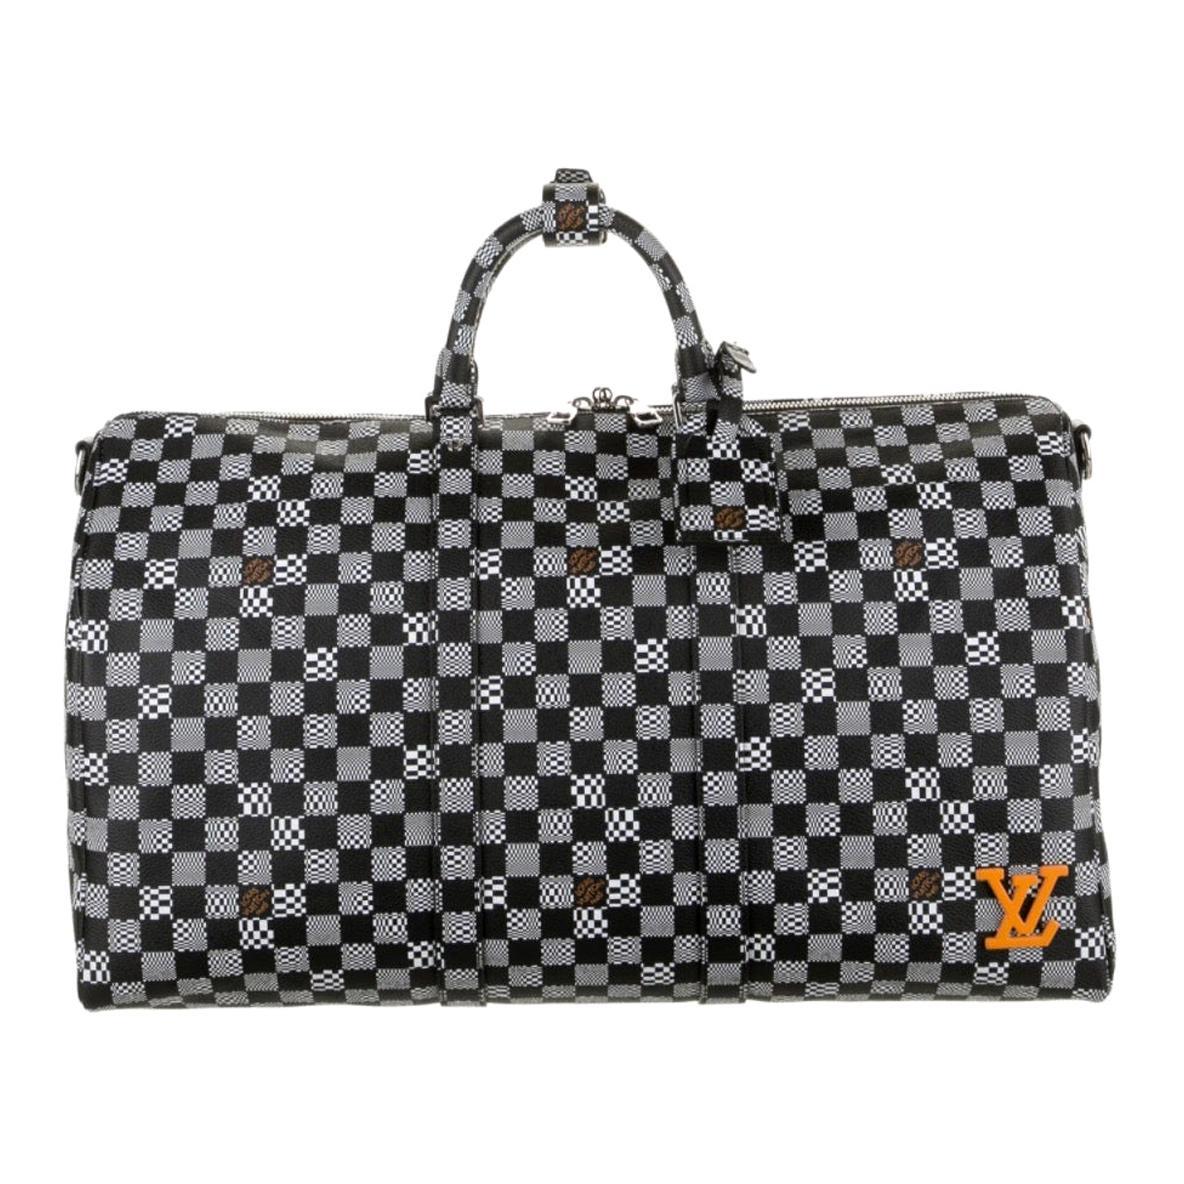 Louis Vuitton Black White Check Men's Women's Carryall Travel Weekend Duffle Bag